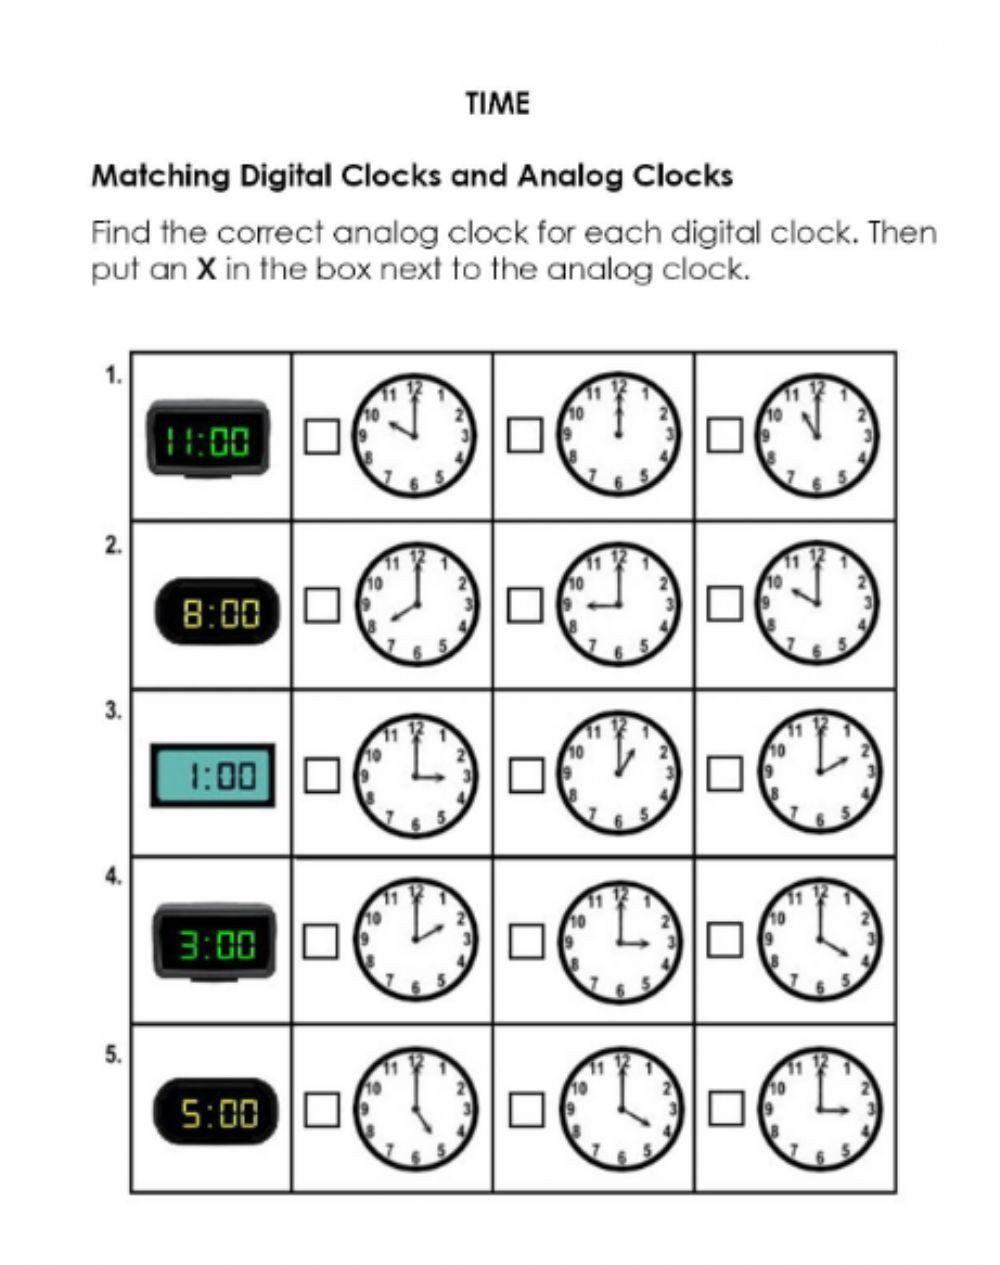 medium resolution of Analogue and Digital Clock Worksheets Match Digital and Analog Clocks  Interactive Worksheet   Clock worksheets